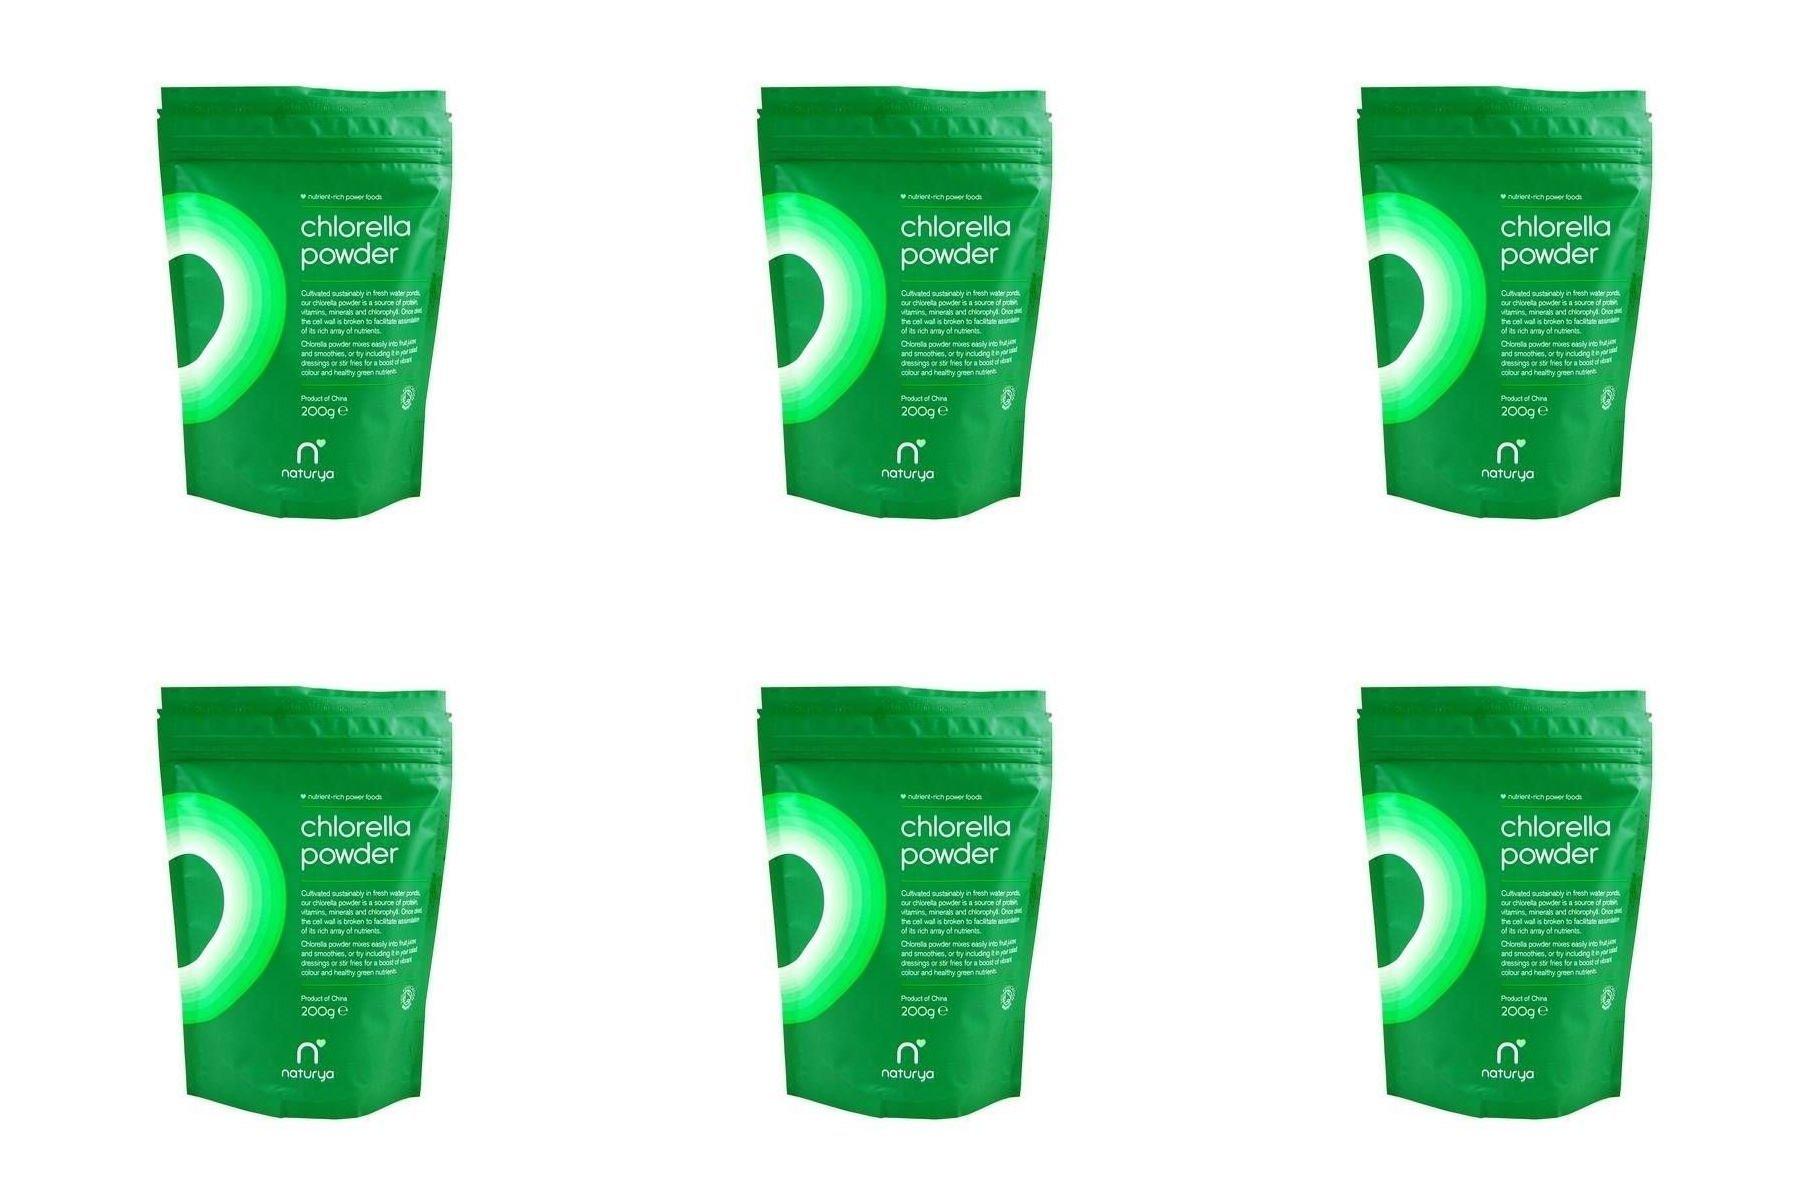 (6 PACK) - Natuyra Organic Chlorella Powder   200g   6 PACK - SUPER SAVER - SAVE MONEY